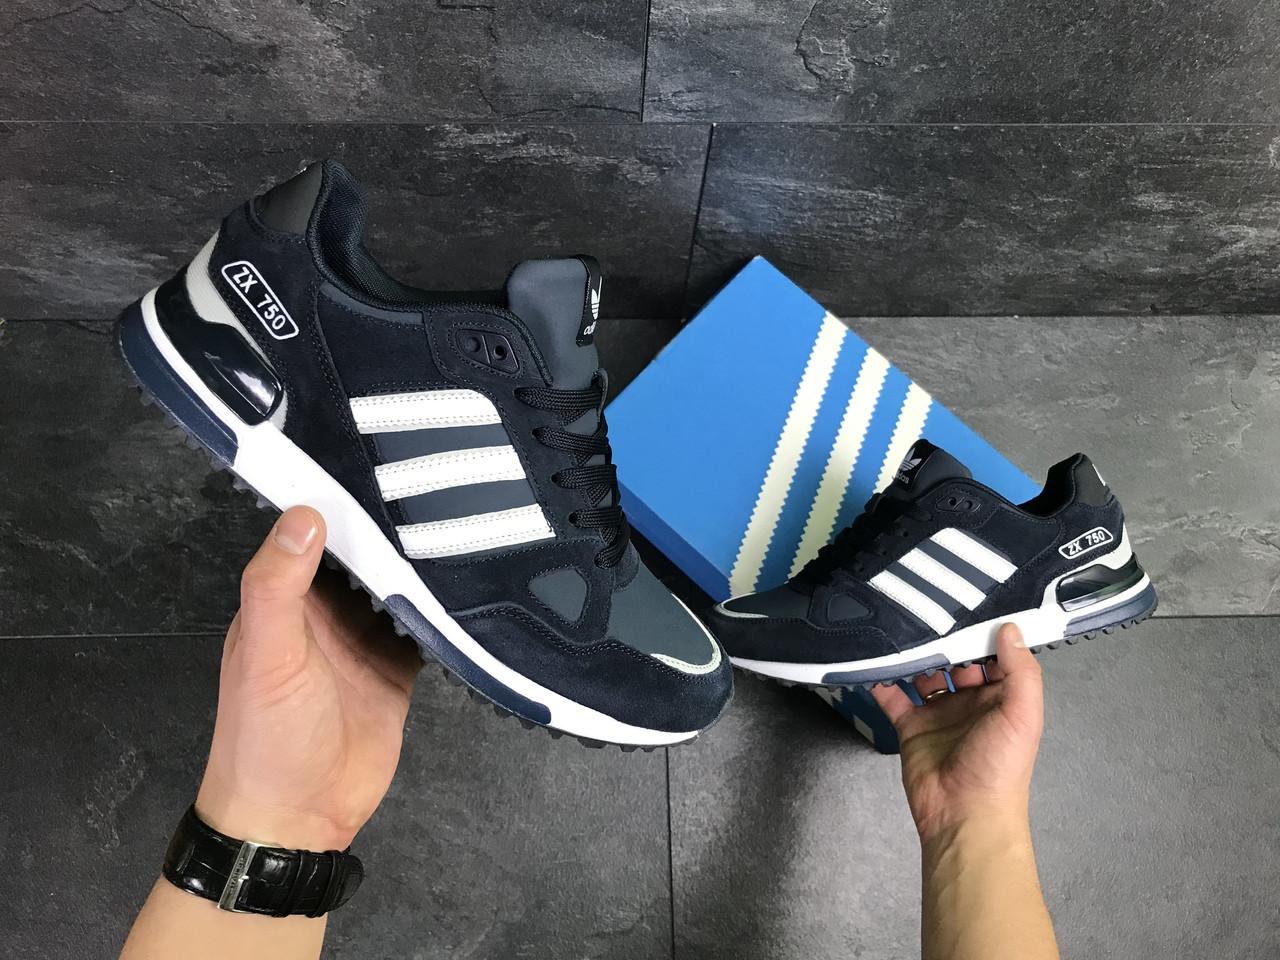 d25061fd Мужские Кроссовки Adidas ZX750 (Темно-синие с Белым) — в Категории ...